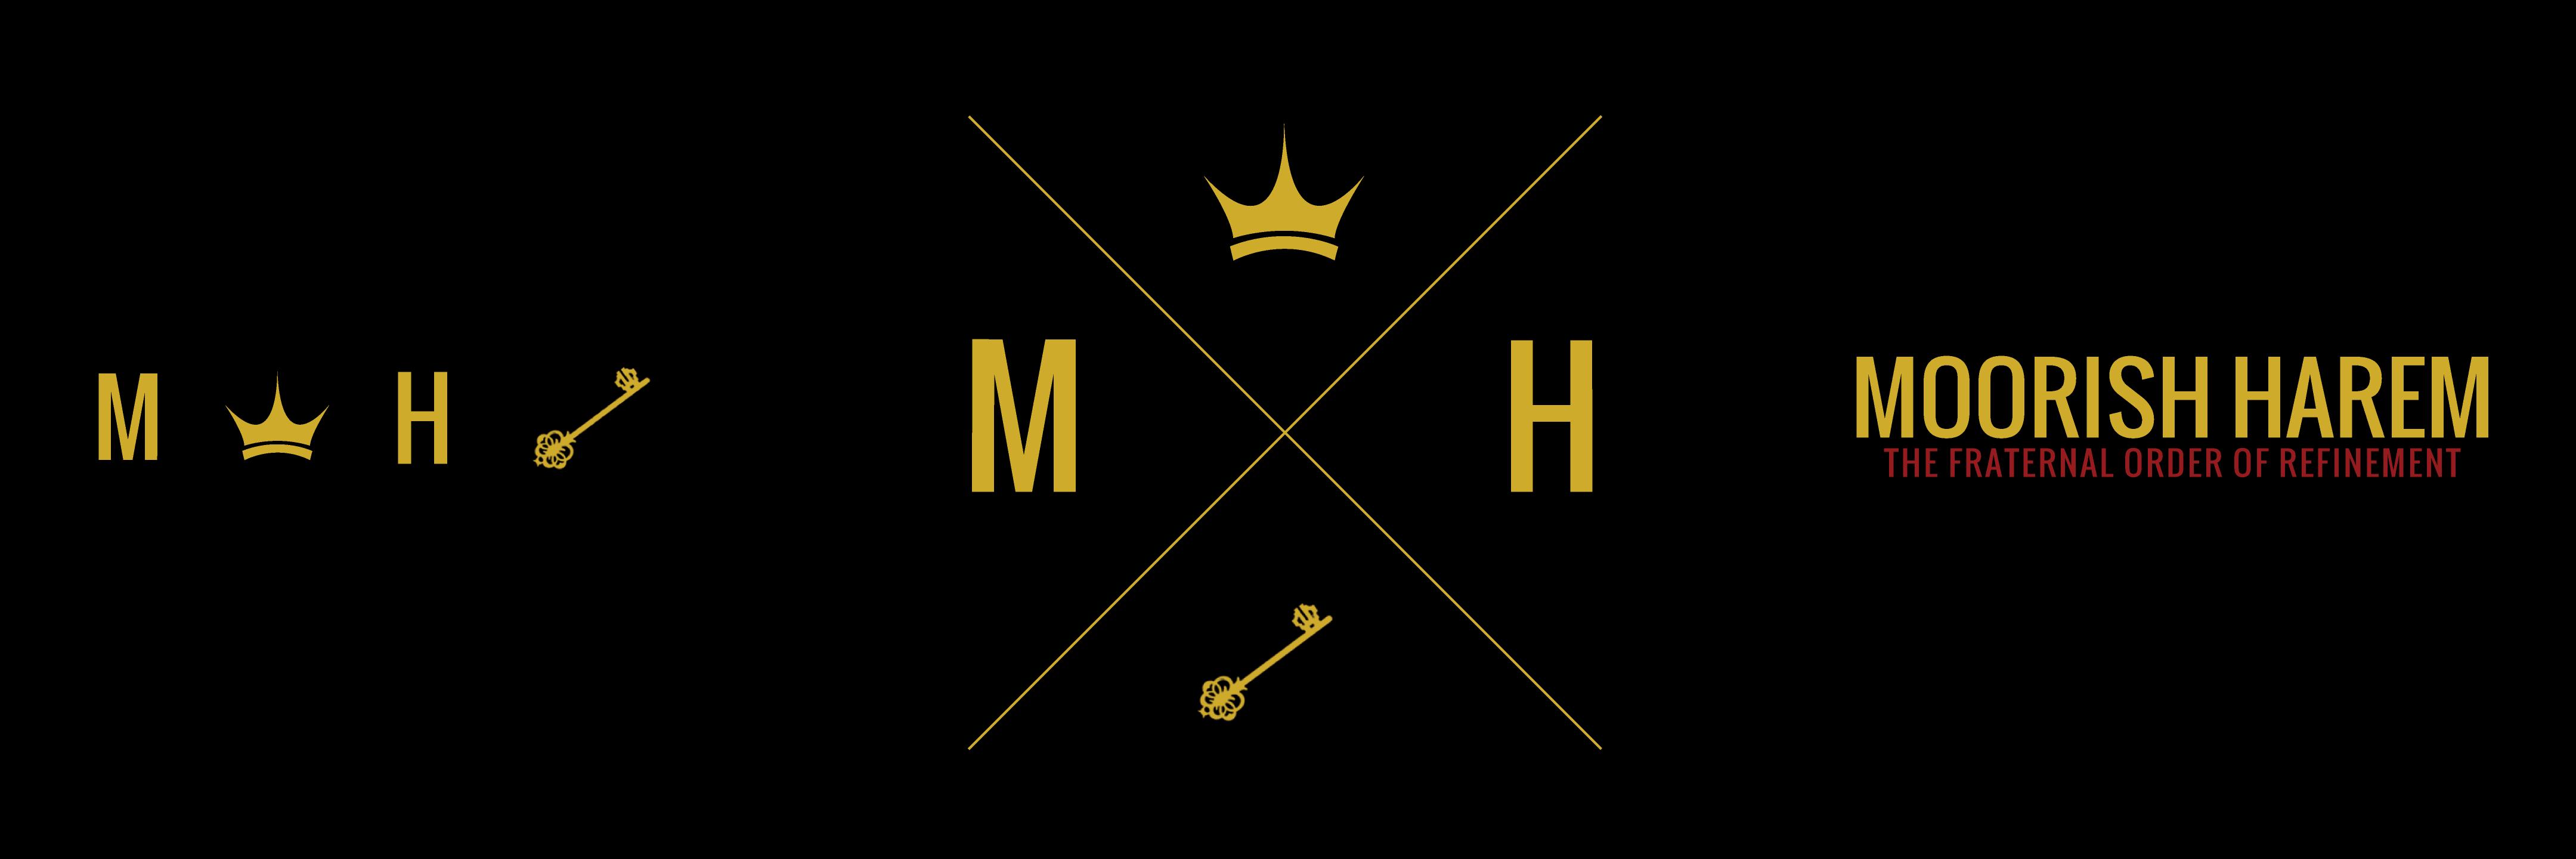 Moorish Harem